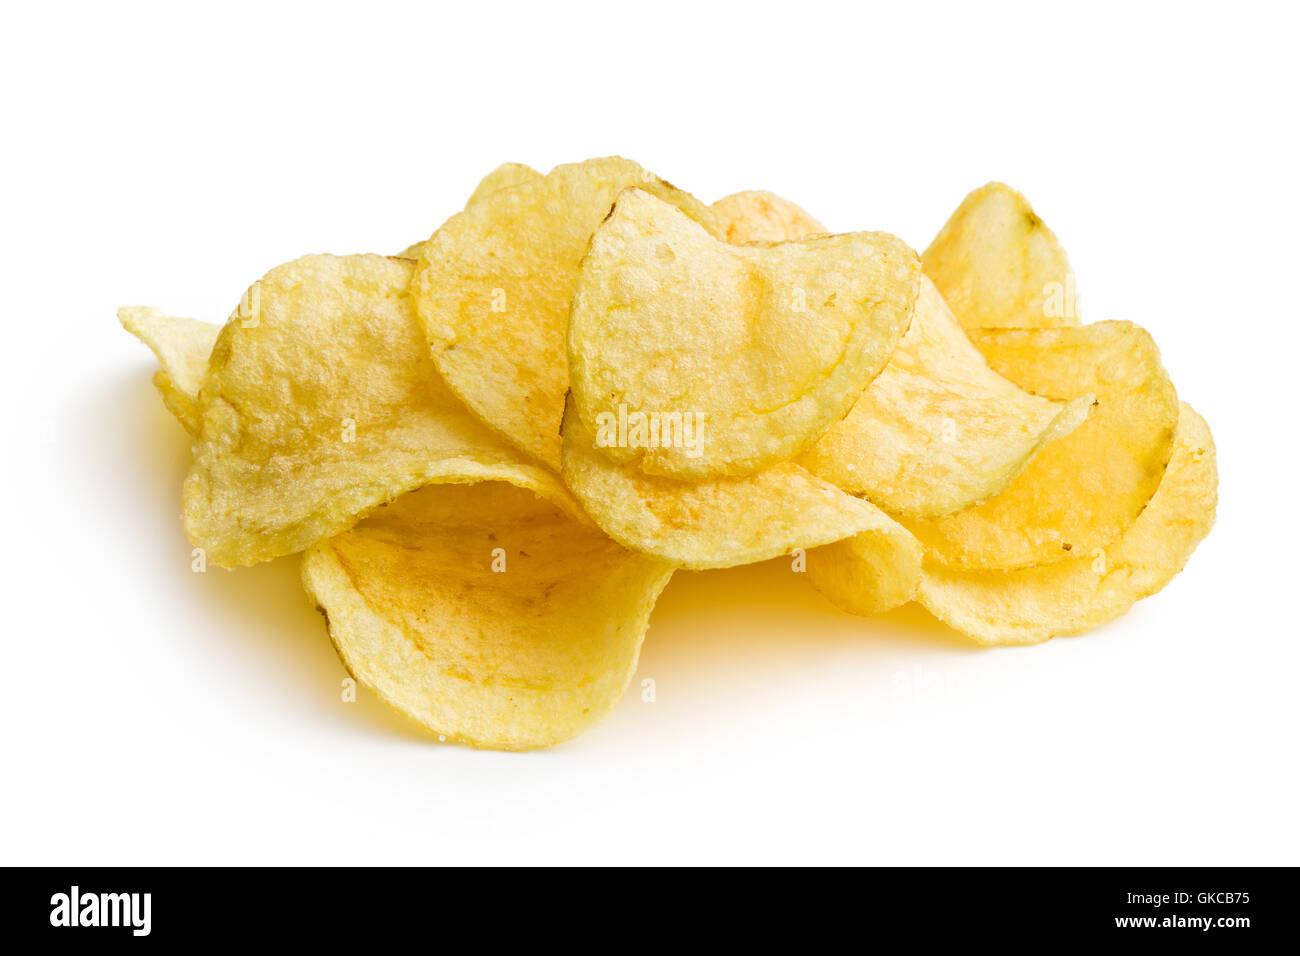 unhealthy potato chips - Stock Image